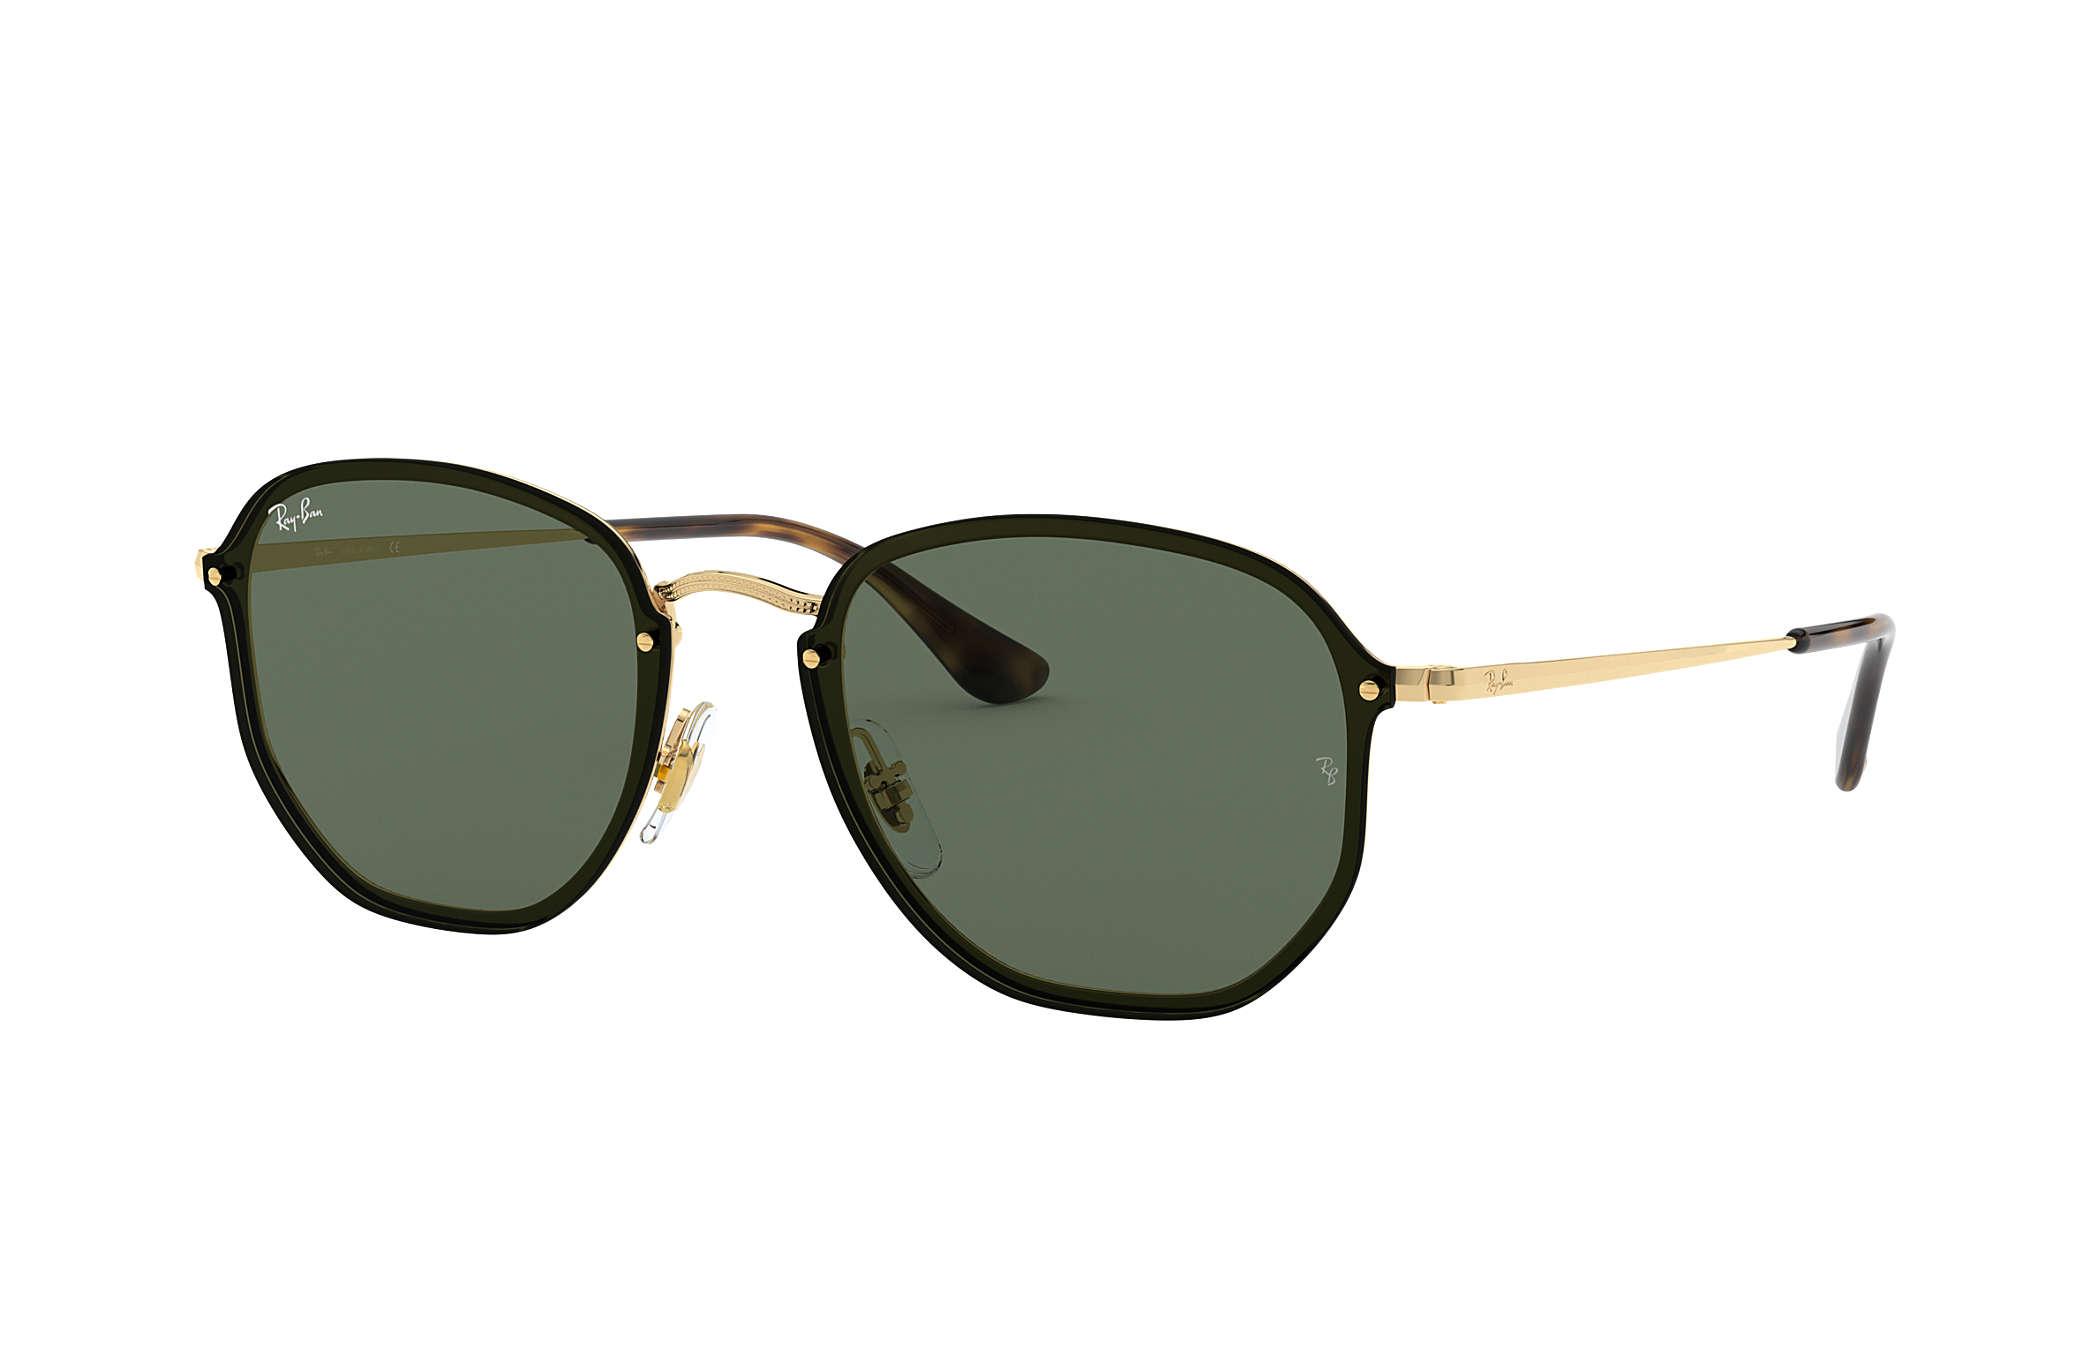 11ee93f9ccfa9 Ray-Ban Blaze Hexagonal RB3579N Gold - Metal - Green Lenses ...